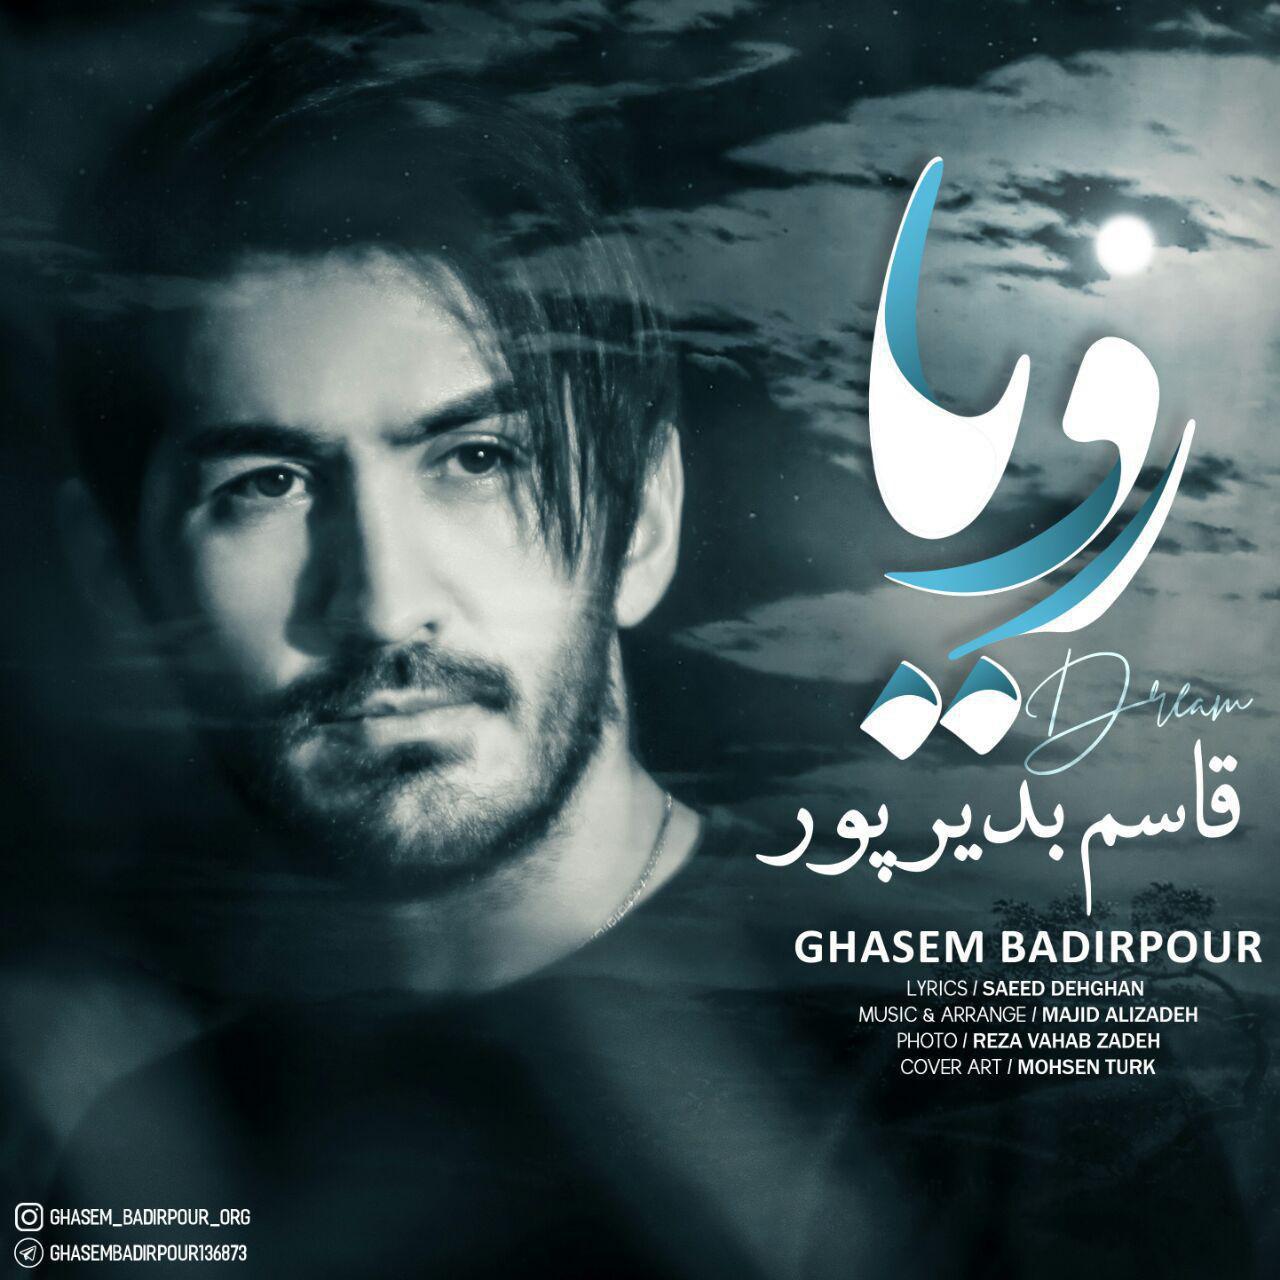 http://birtunes.ir/wp-content/uploads/2018/12/Ghasem-Badirpour-Roya.jpg